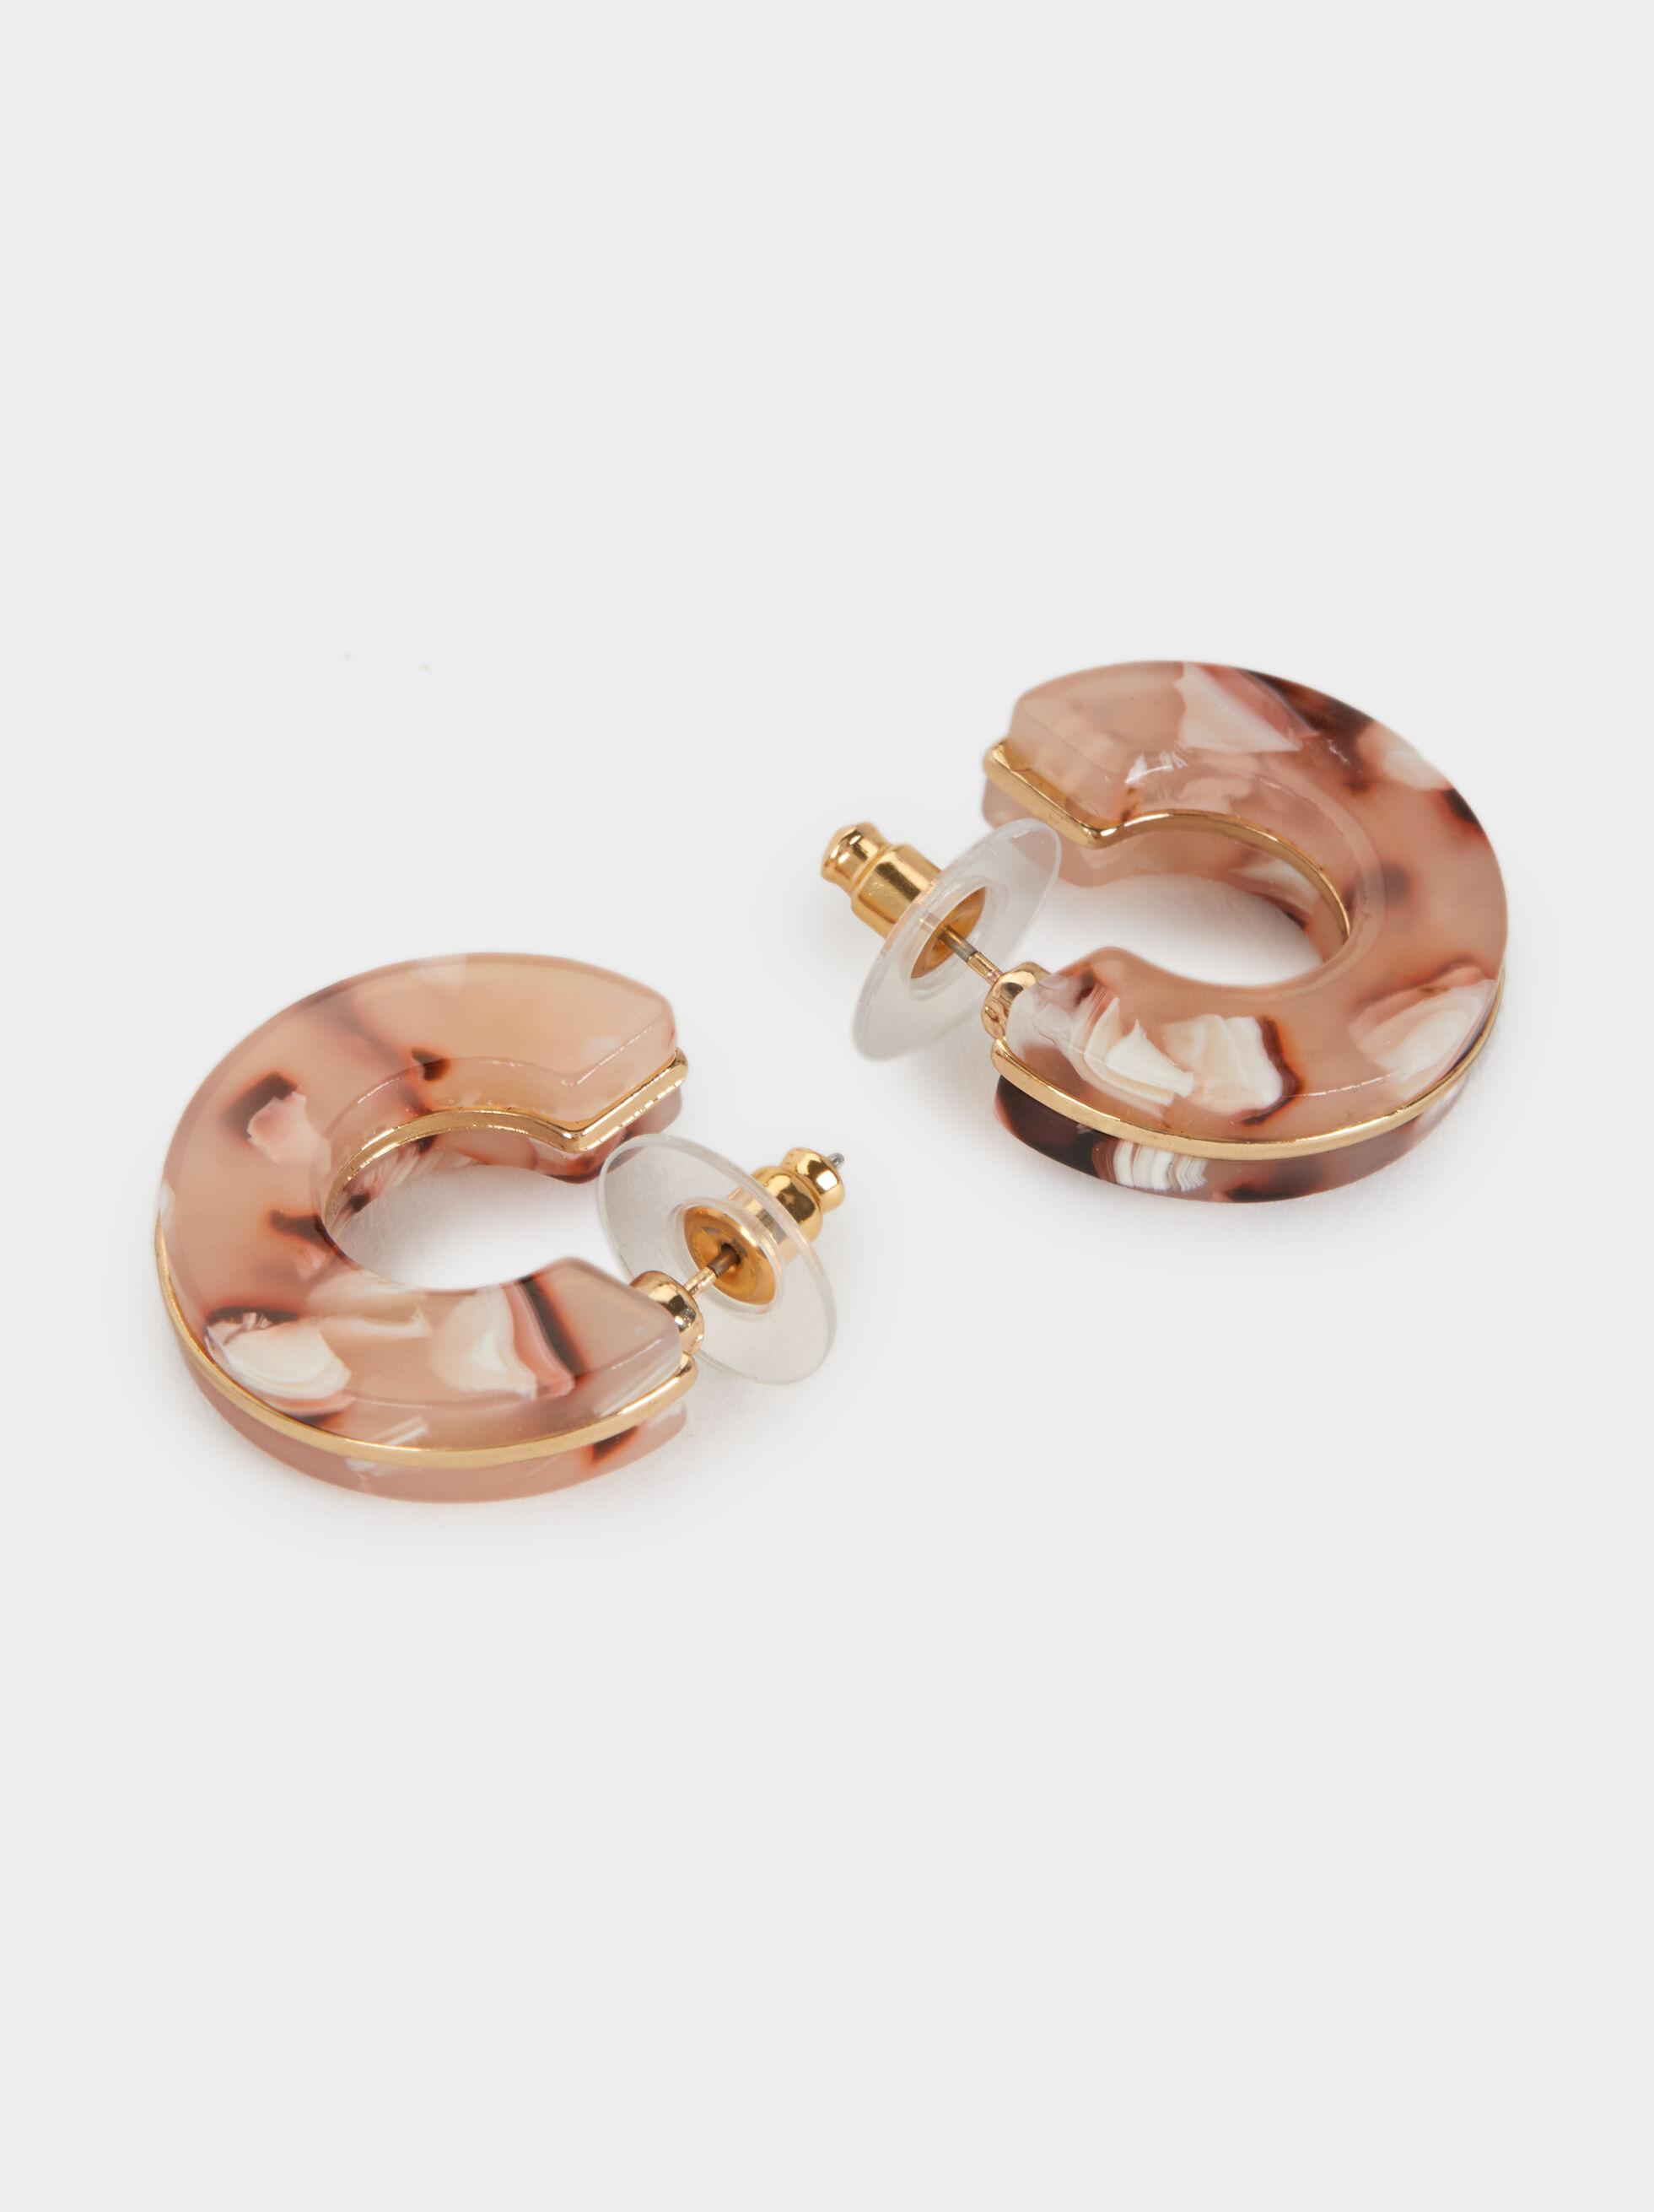 Land Small Tortoiseshell Hoop Earrings, Multicolor, hi-res